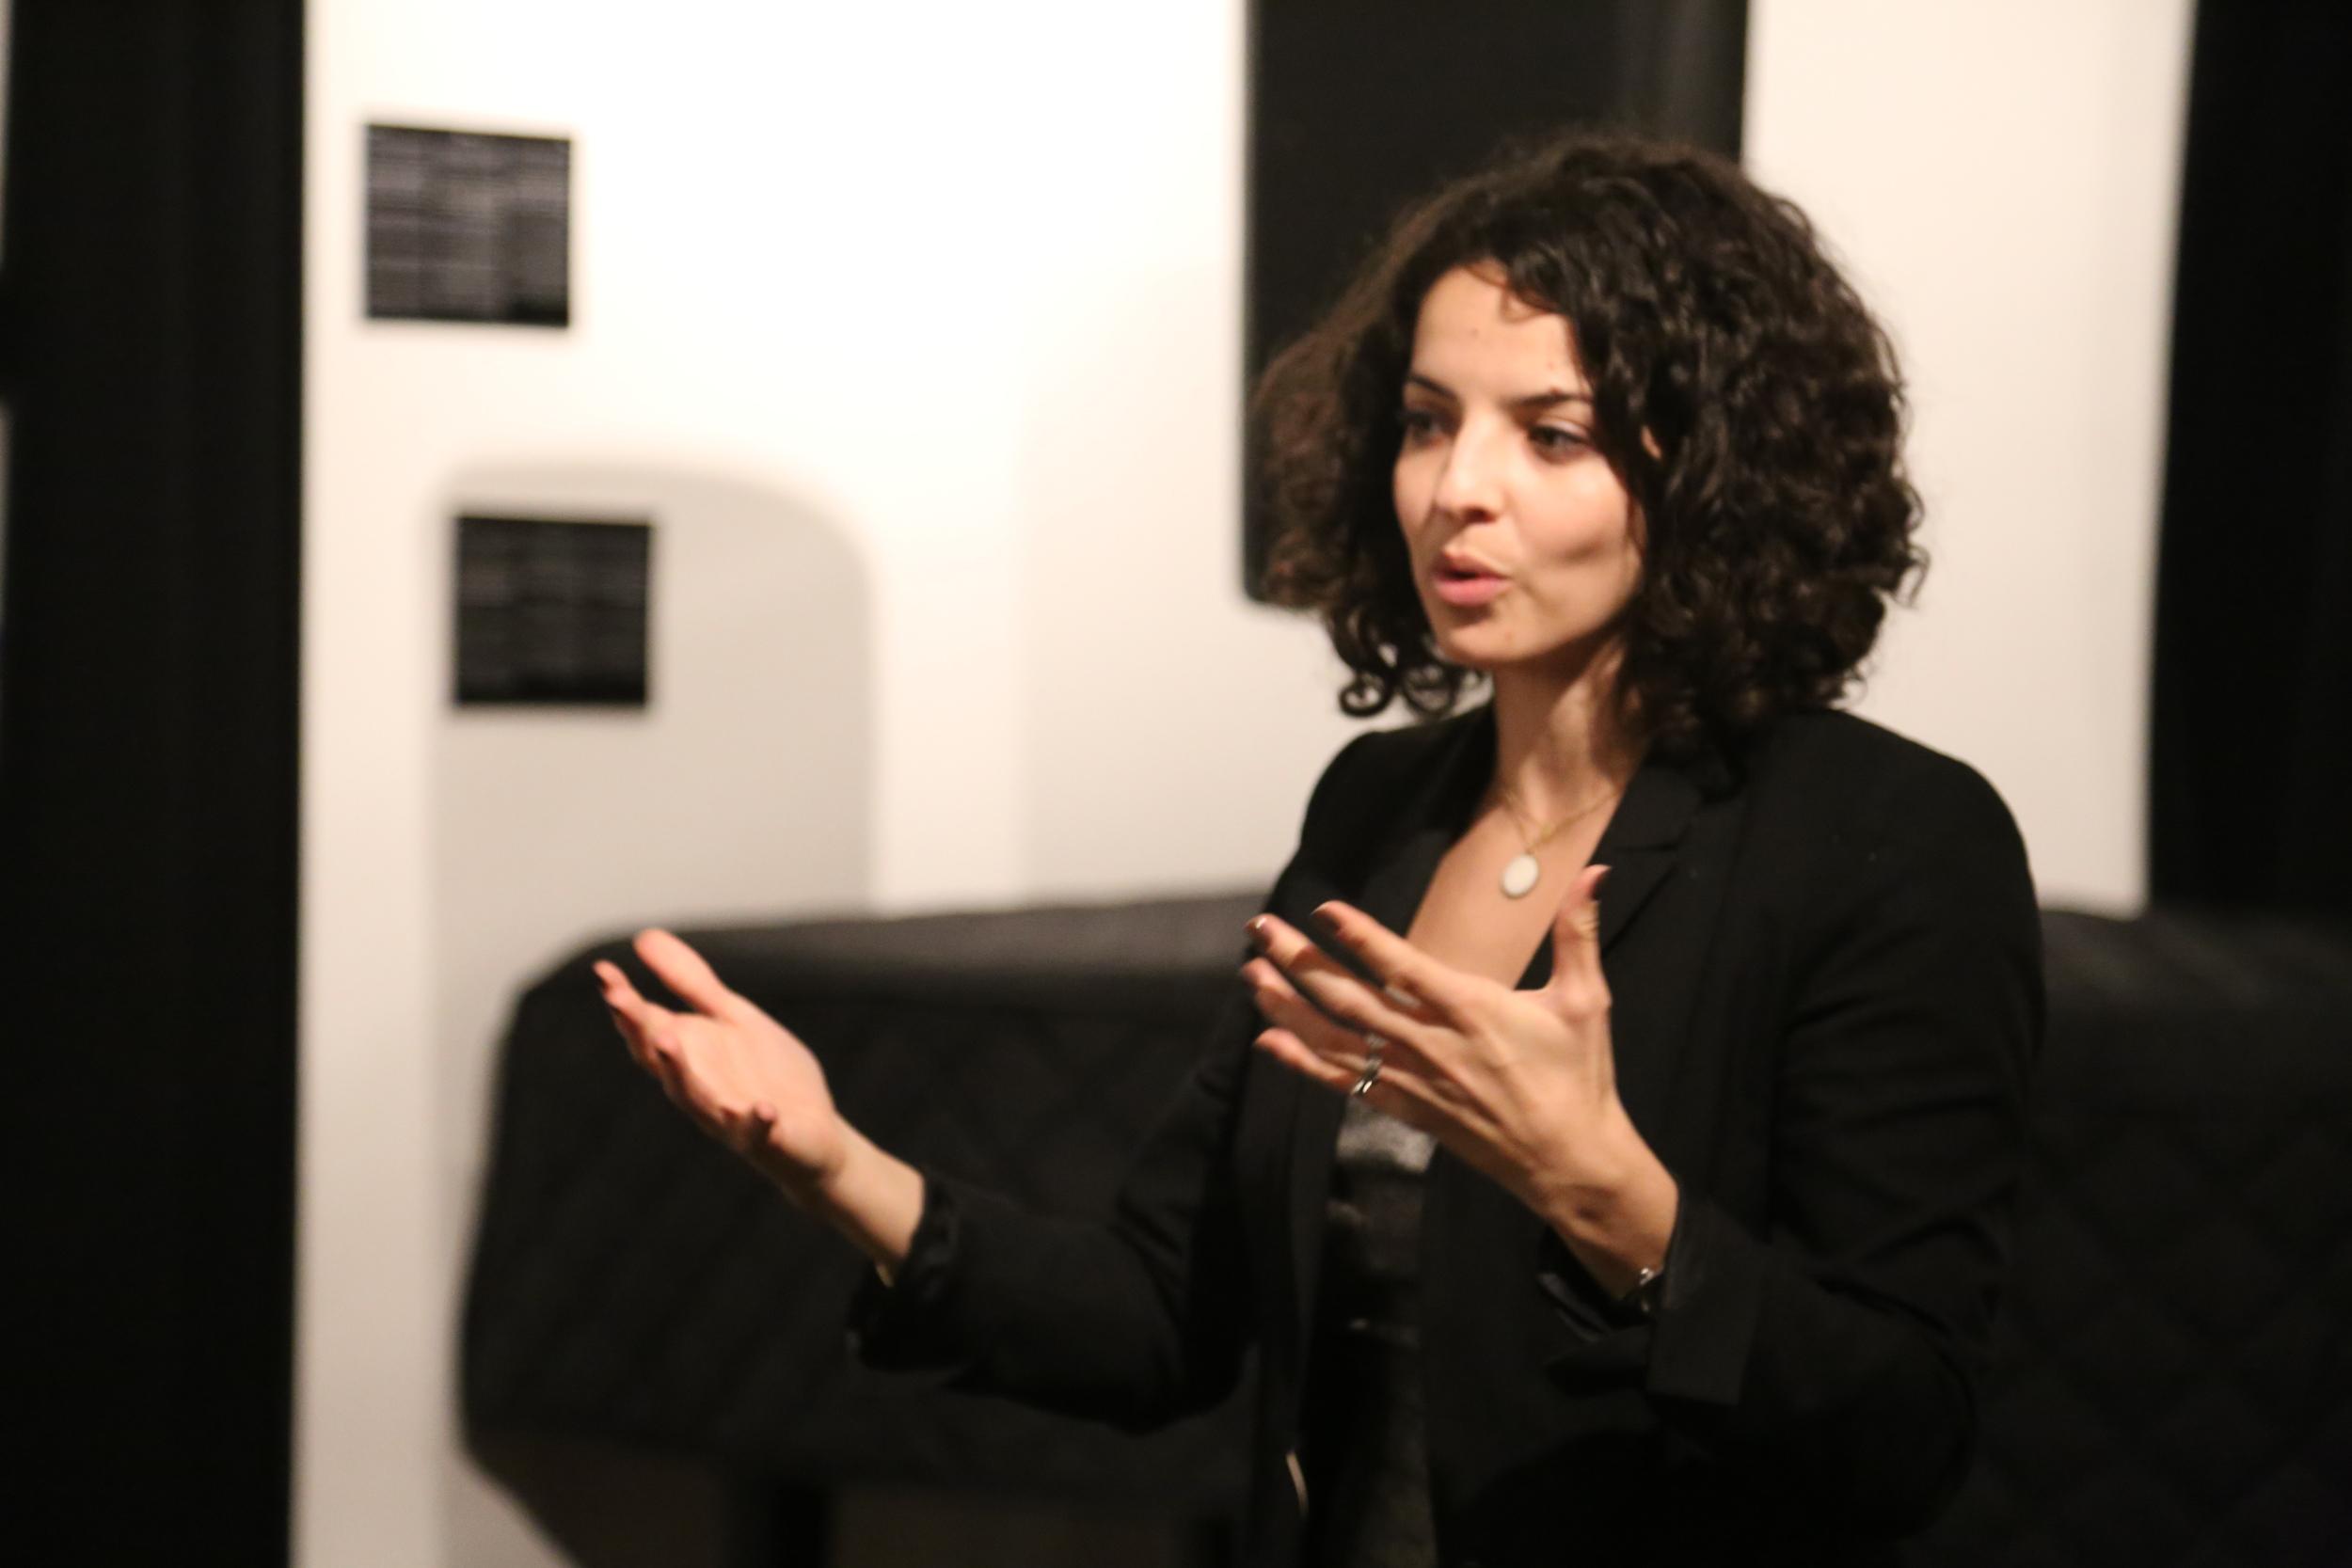 Nadia Ben-Youssef, Attorney, Adalah - The Legal Center for Arab Minority Rights in Israel, @nadiaby